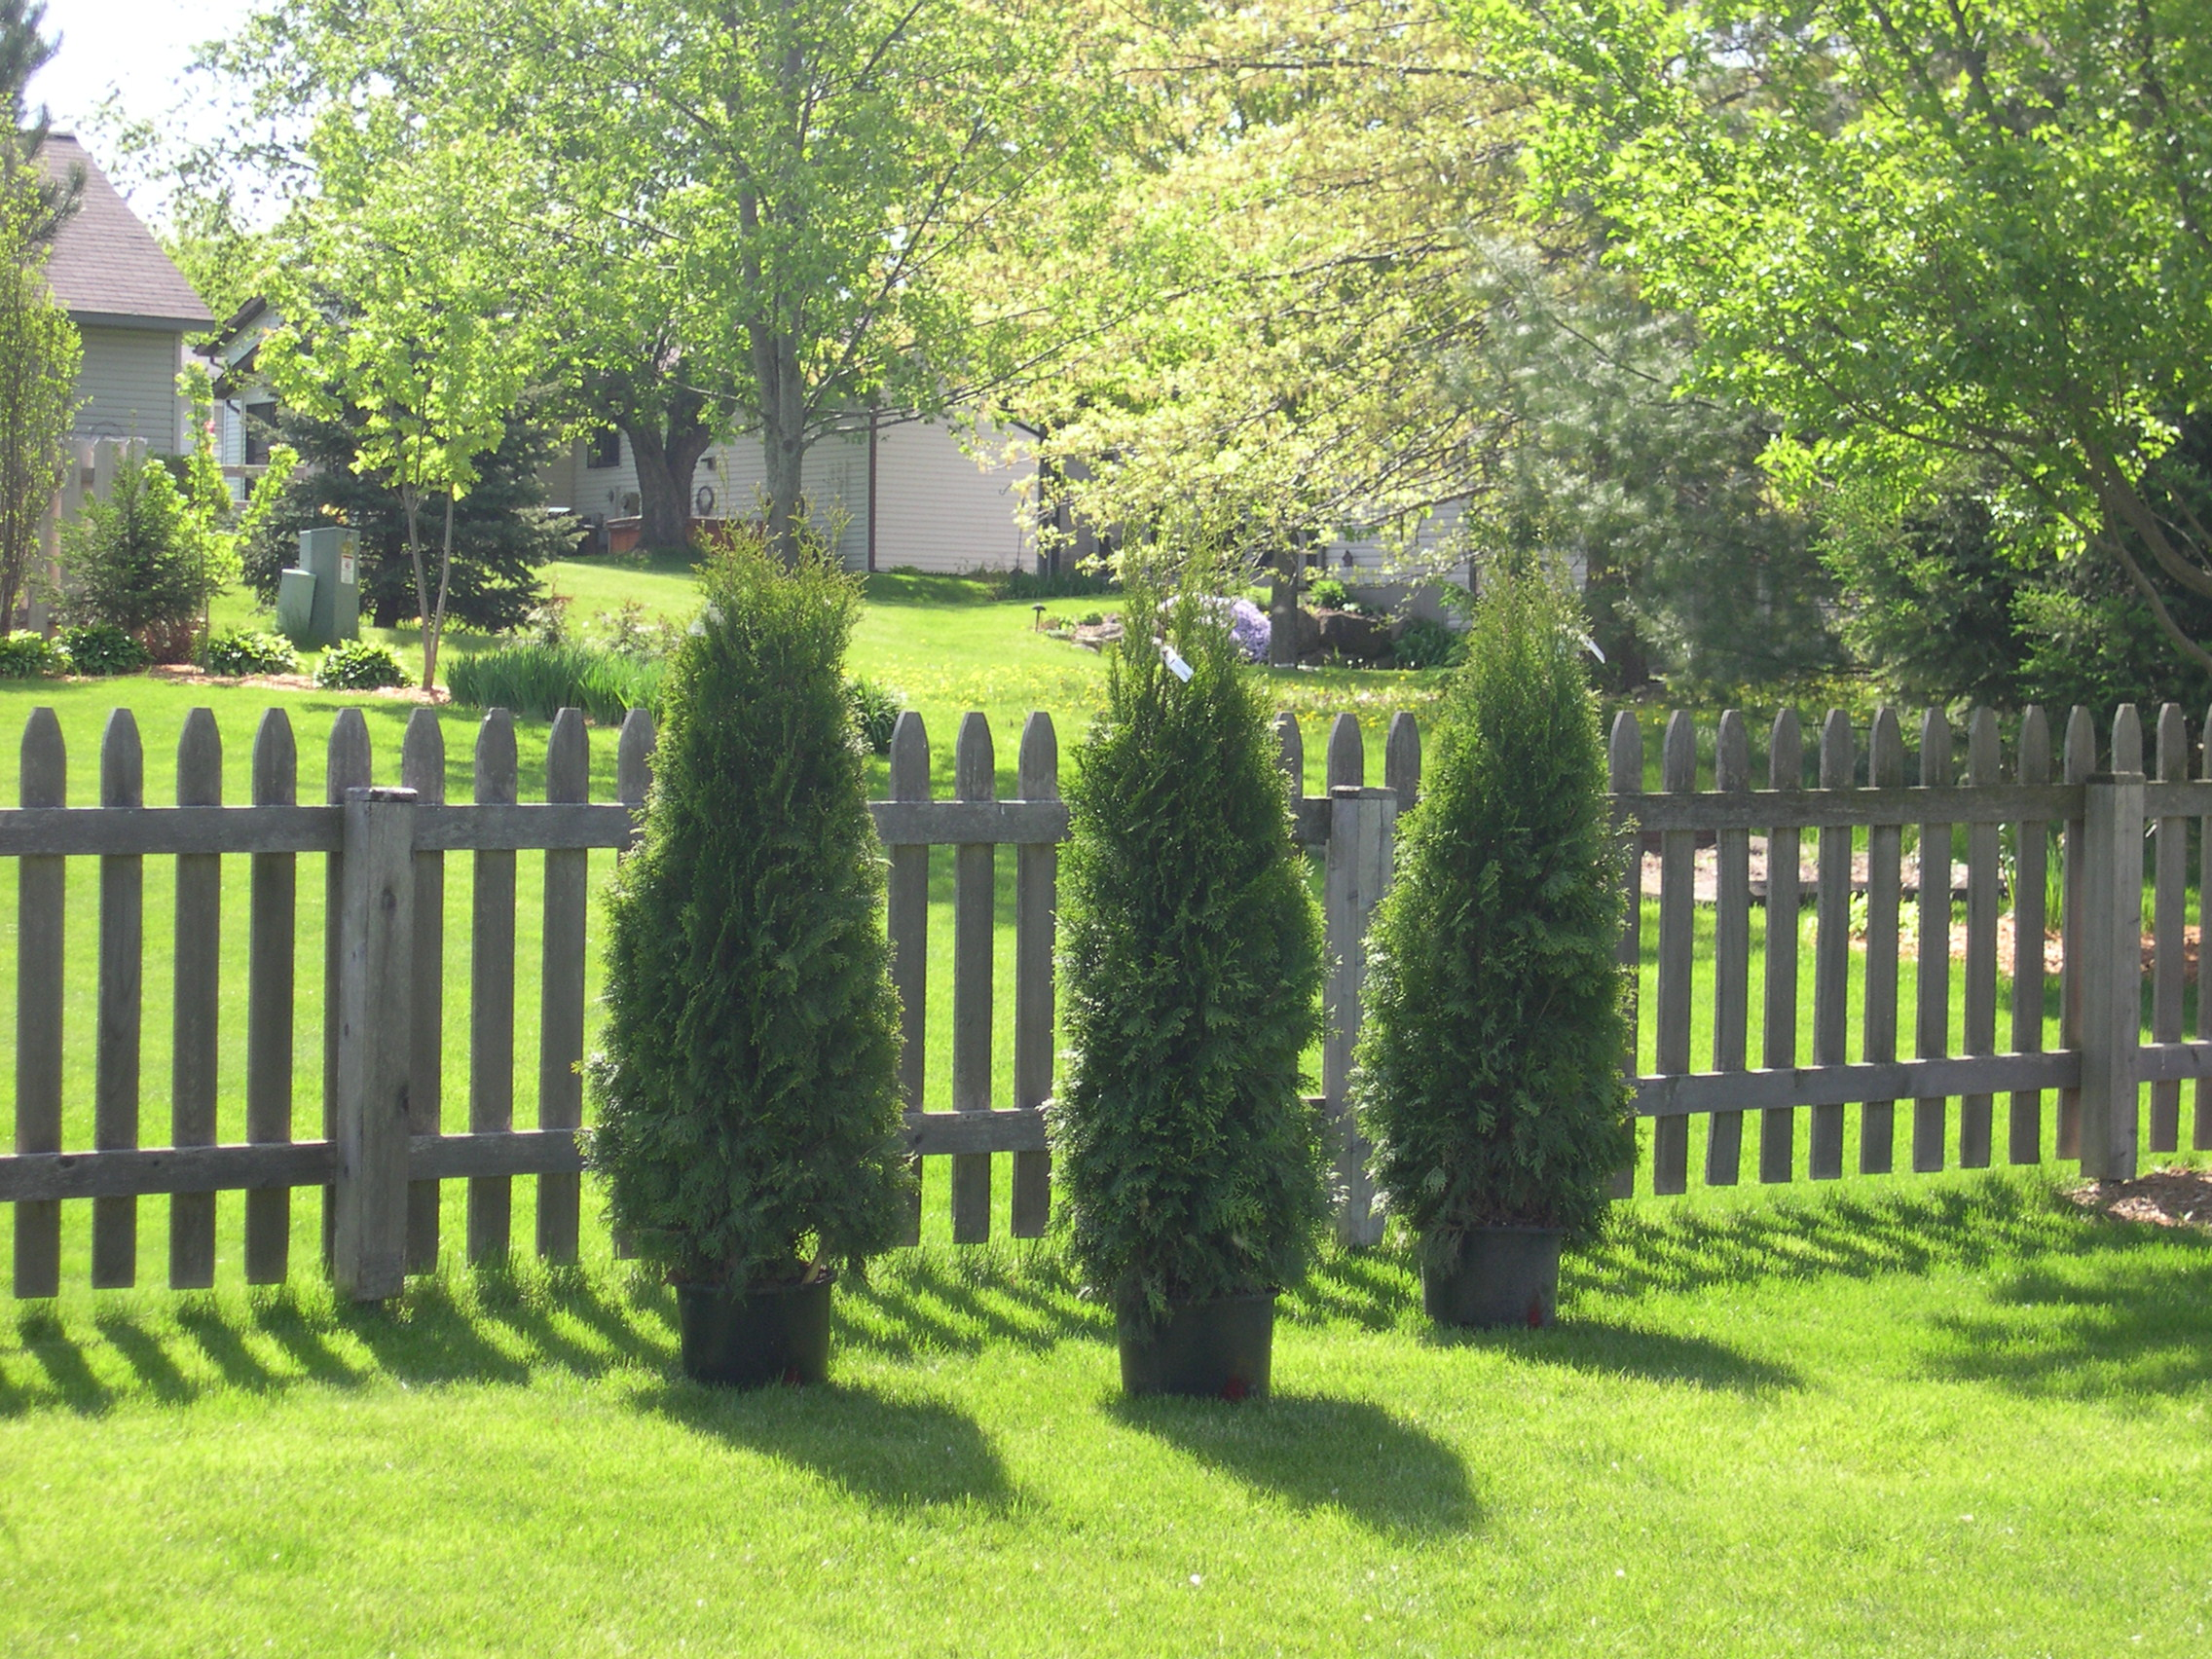 new emerald Arbor Vitae trees